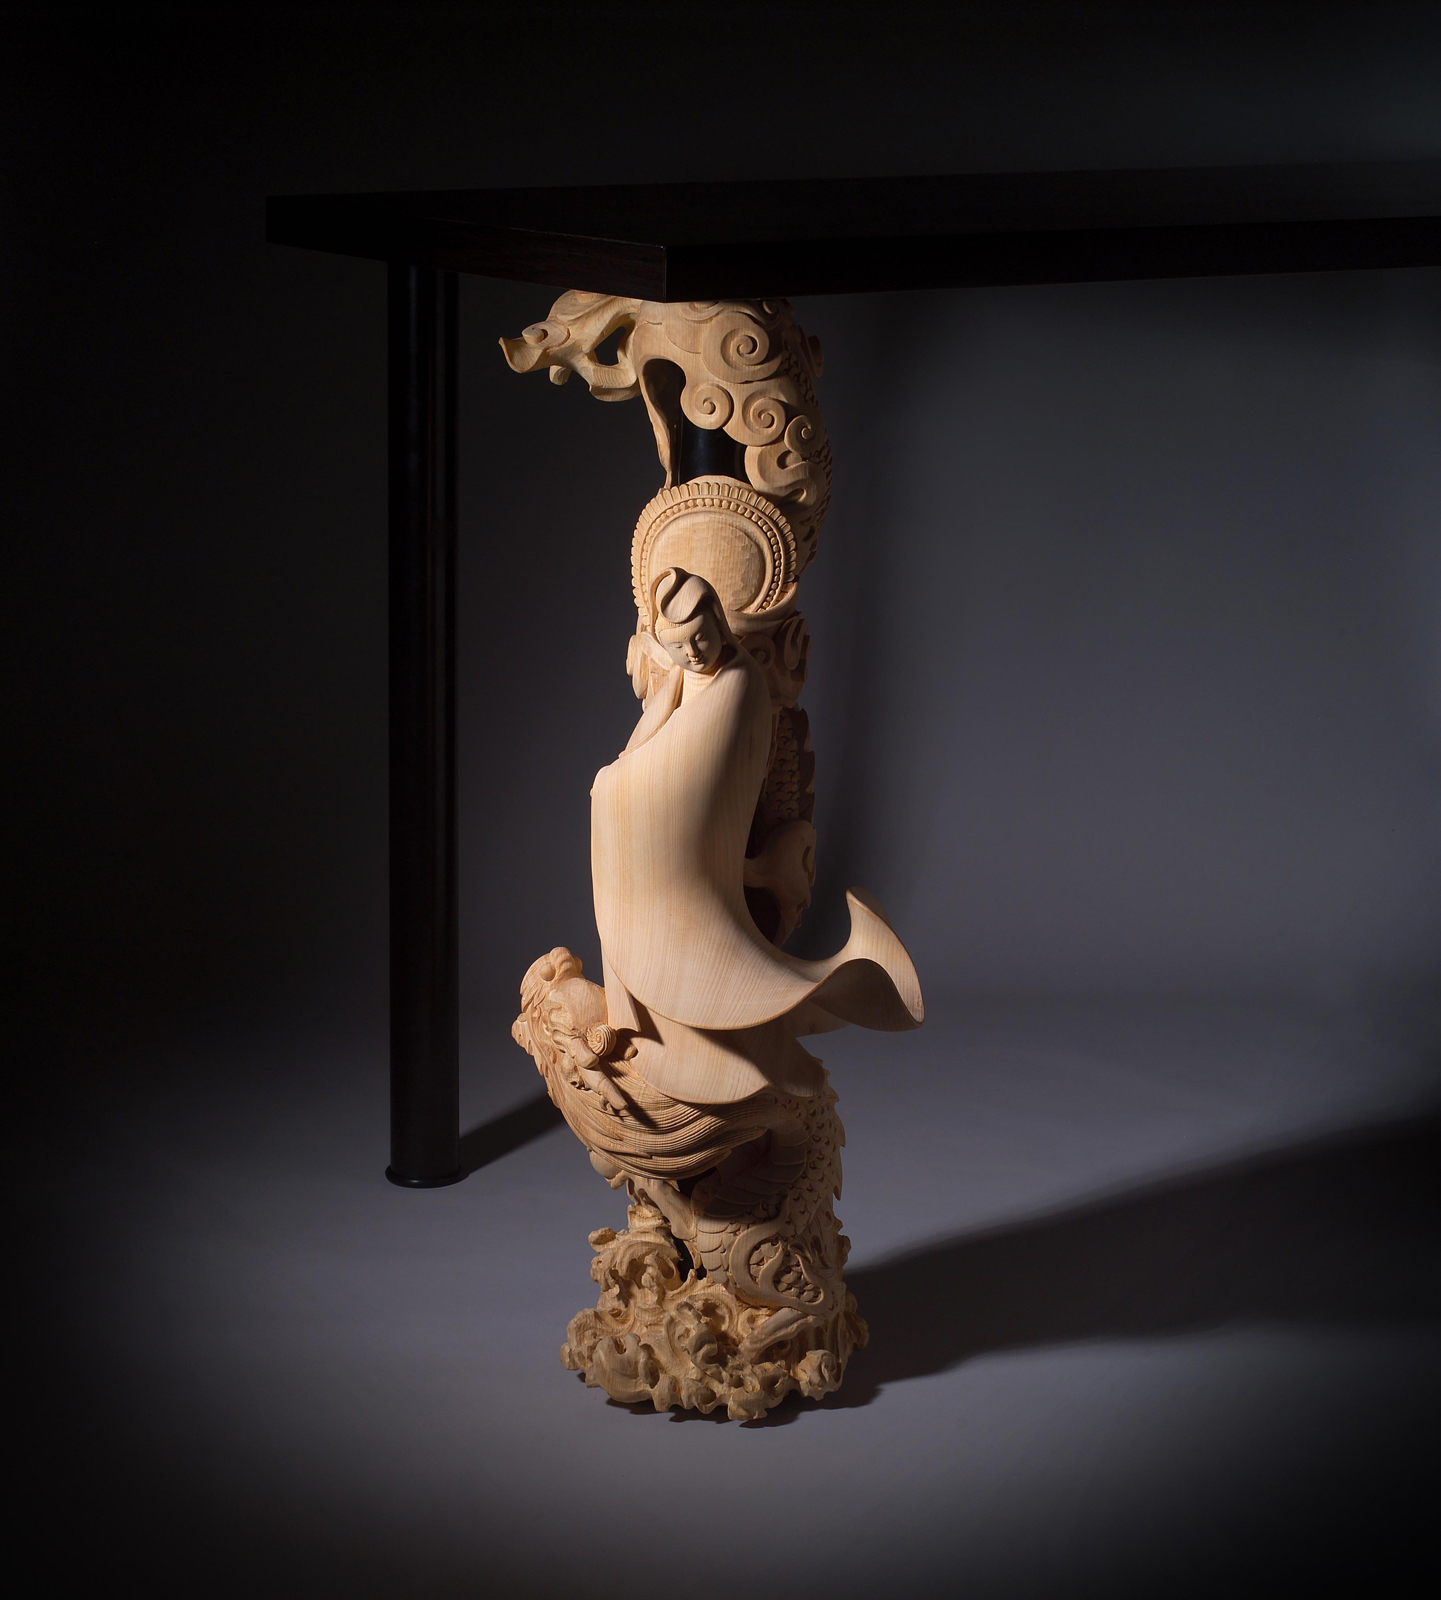 Ikea Plus Vika for Yii. Plastic and metal. Designer: Pili Wu, Craft Maker: Wei-win Lan.